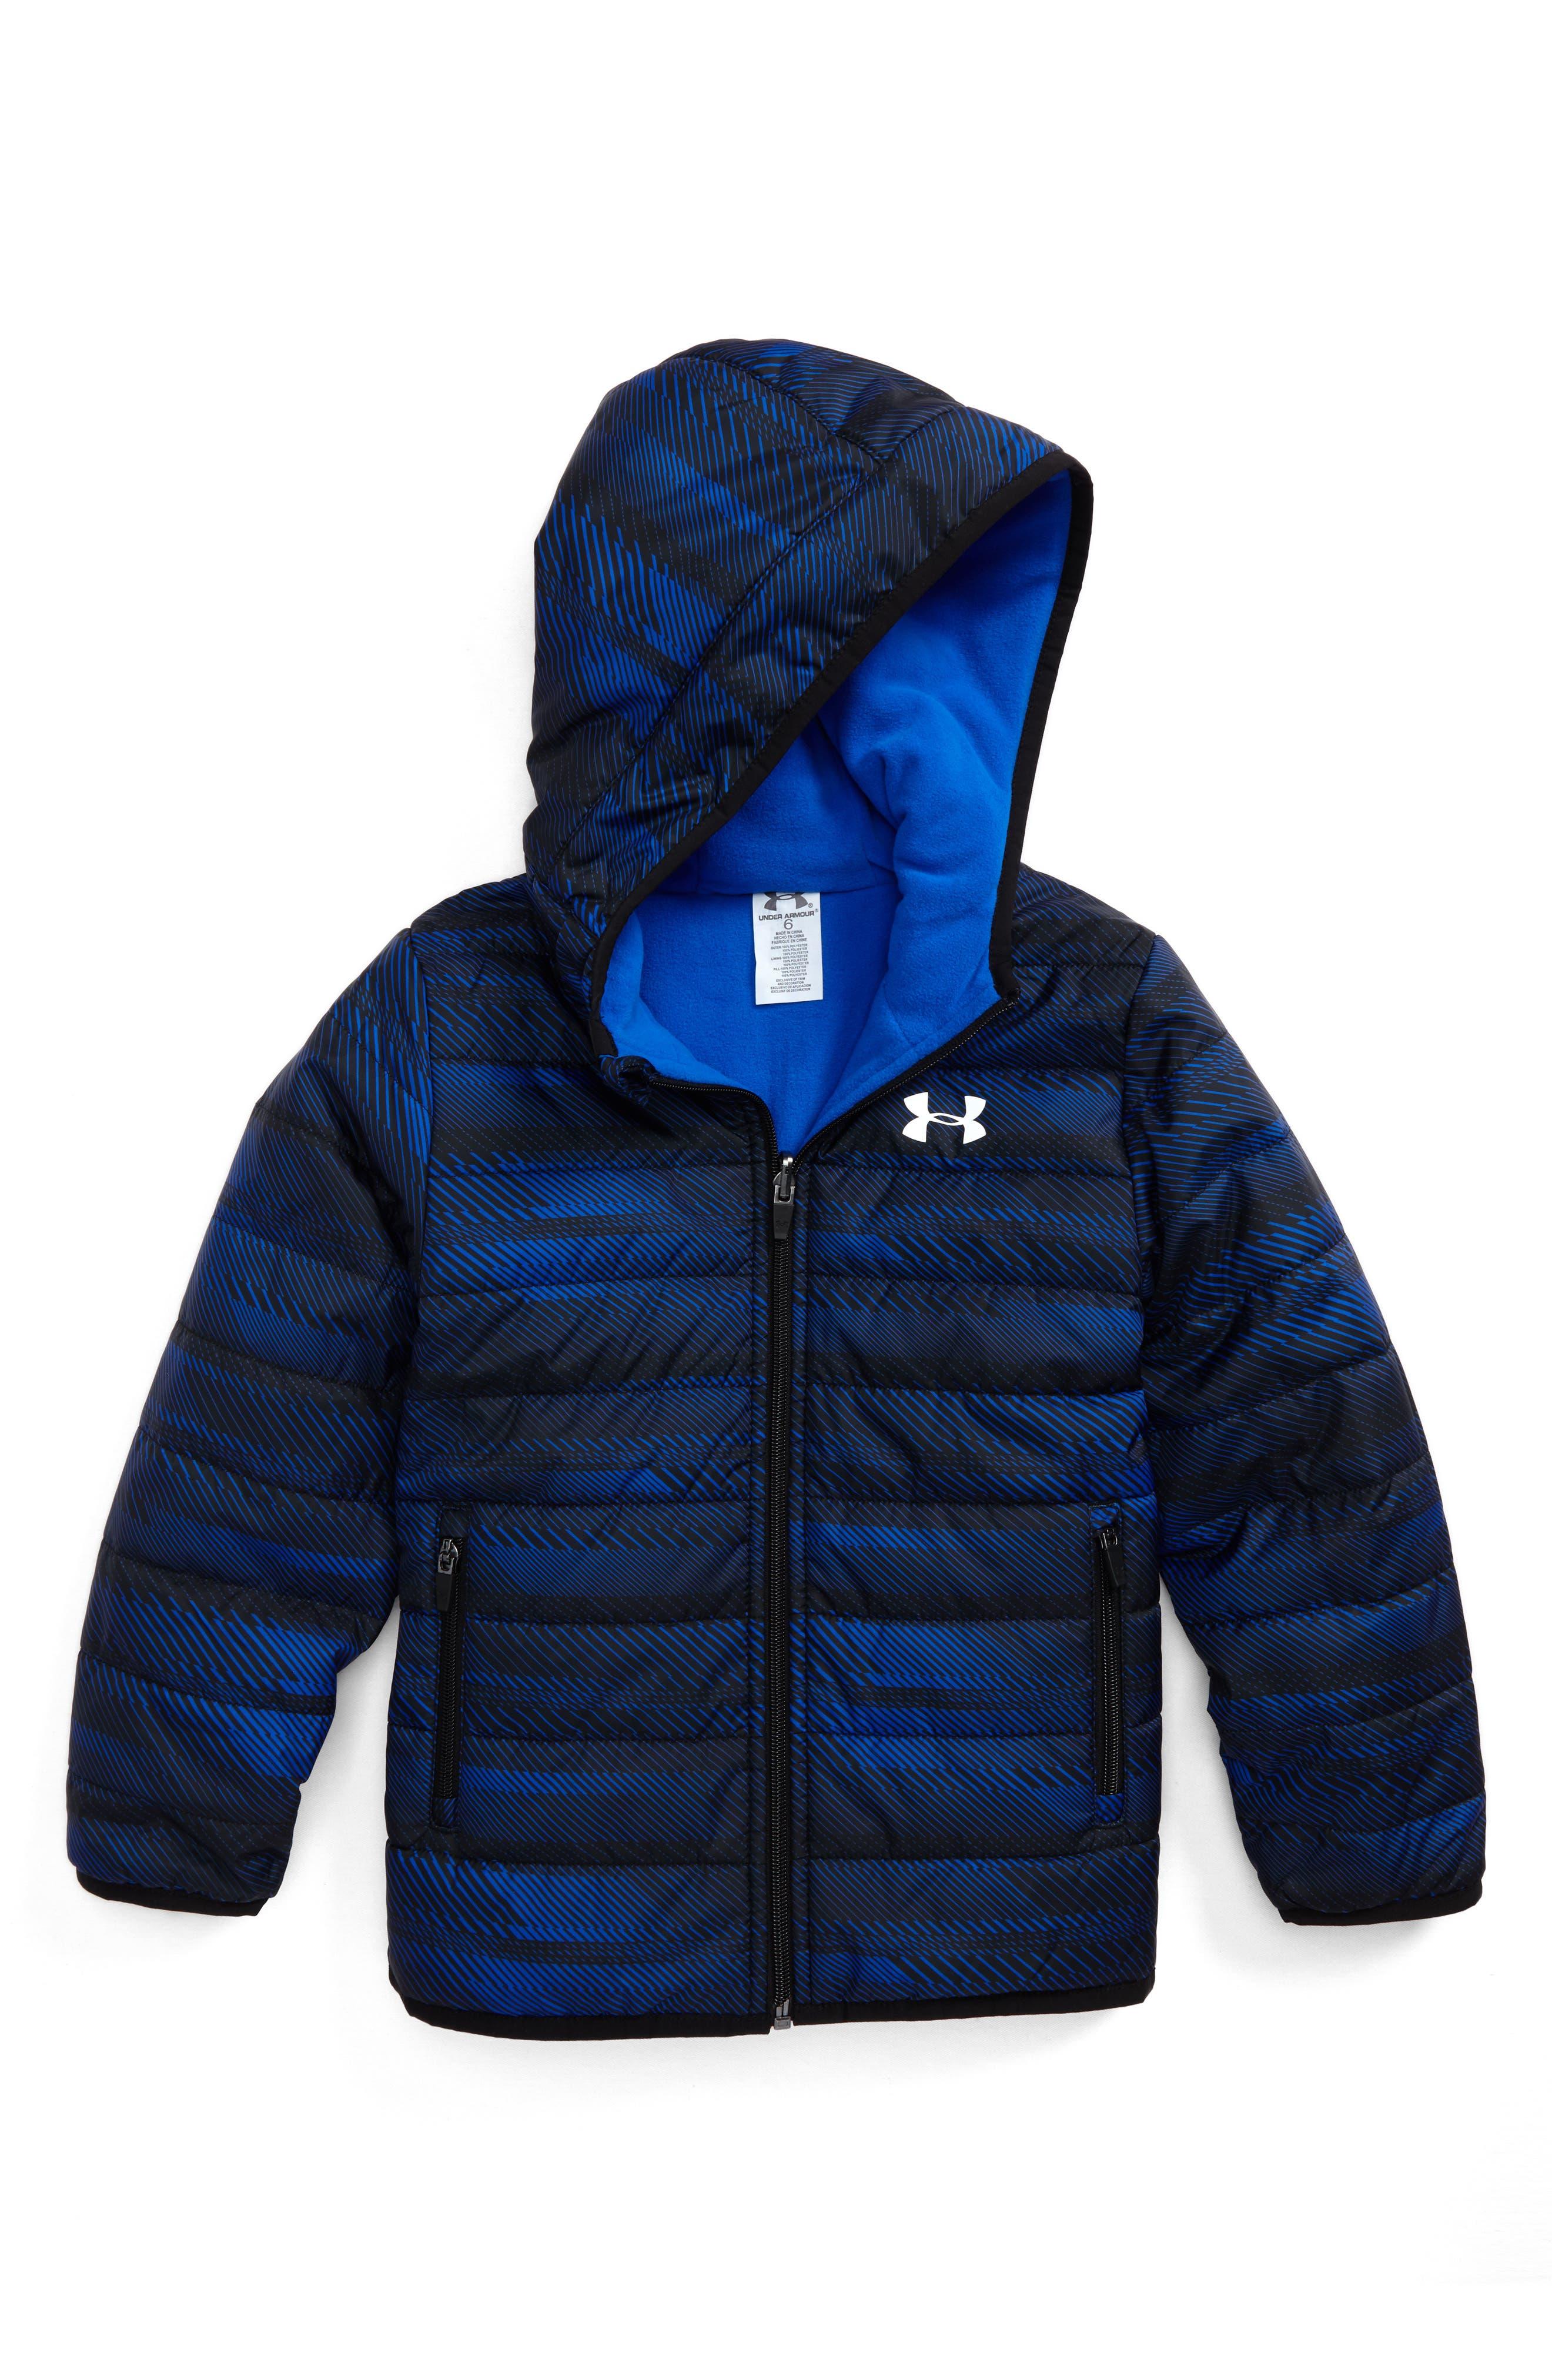 Main Image - Under Armour Speedlines ColdGear® Reversible Puffer Jacket (Toddler Boys & Little Boys)